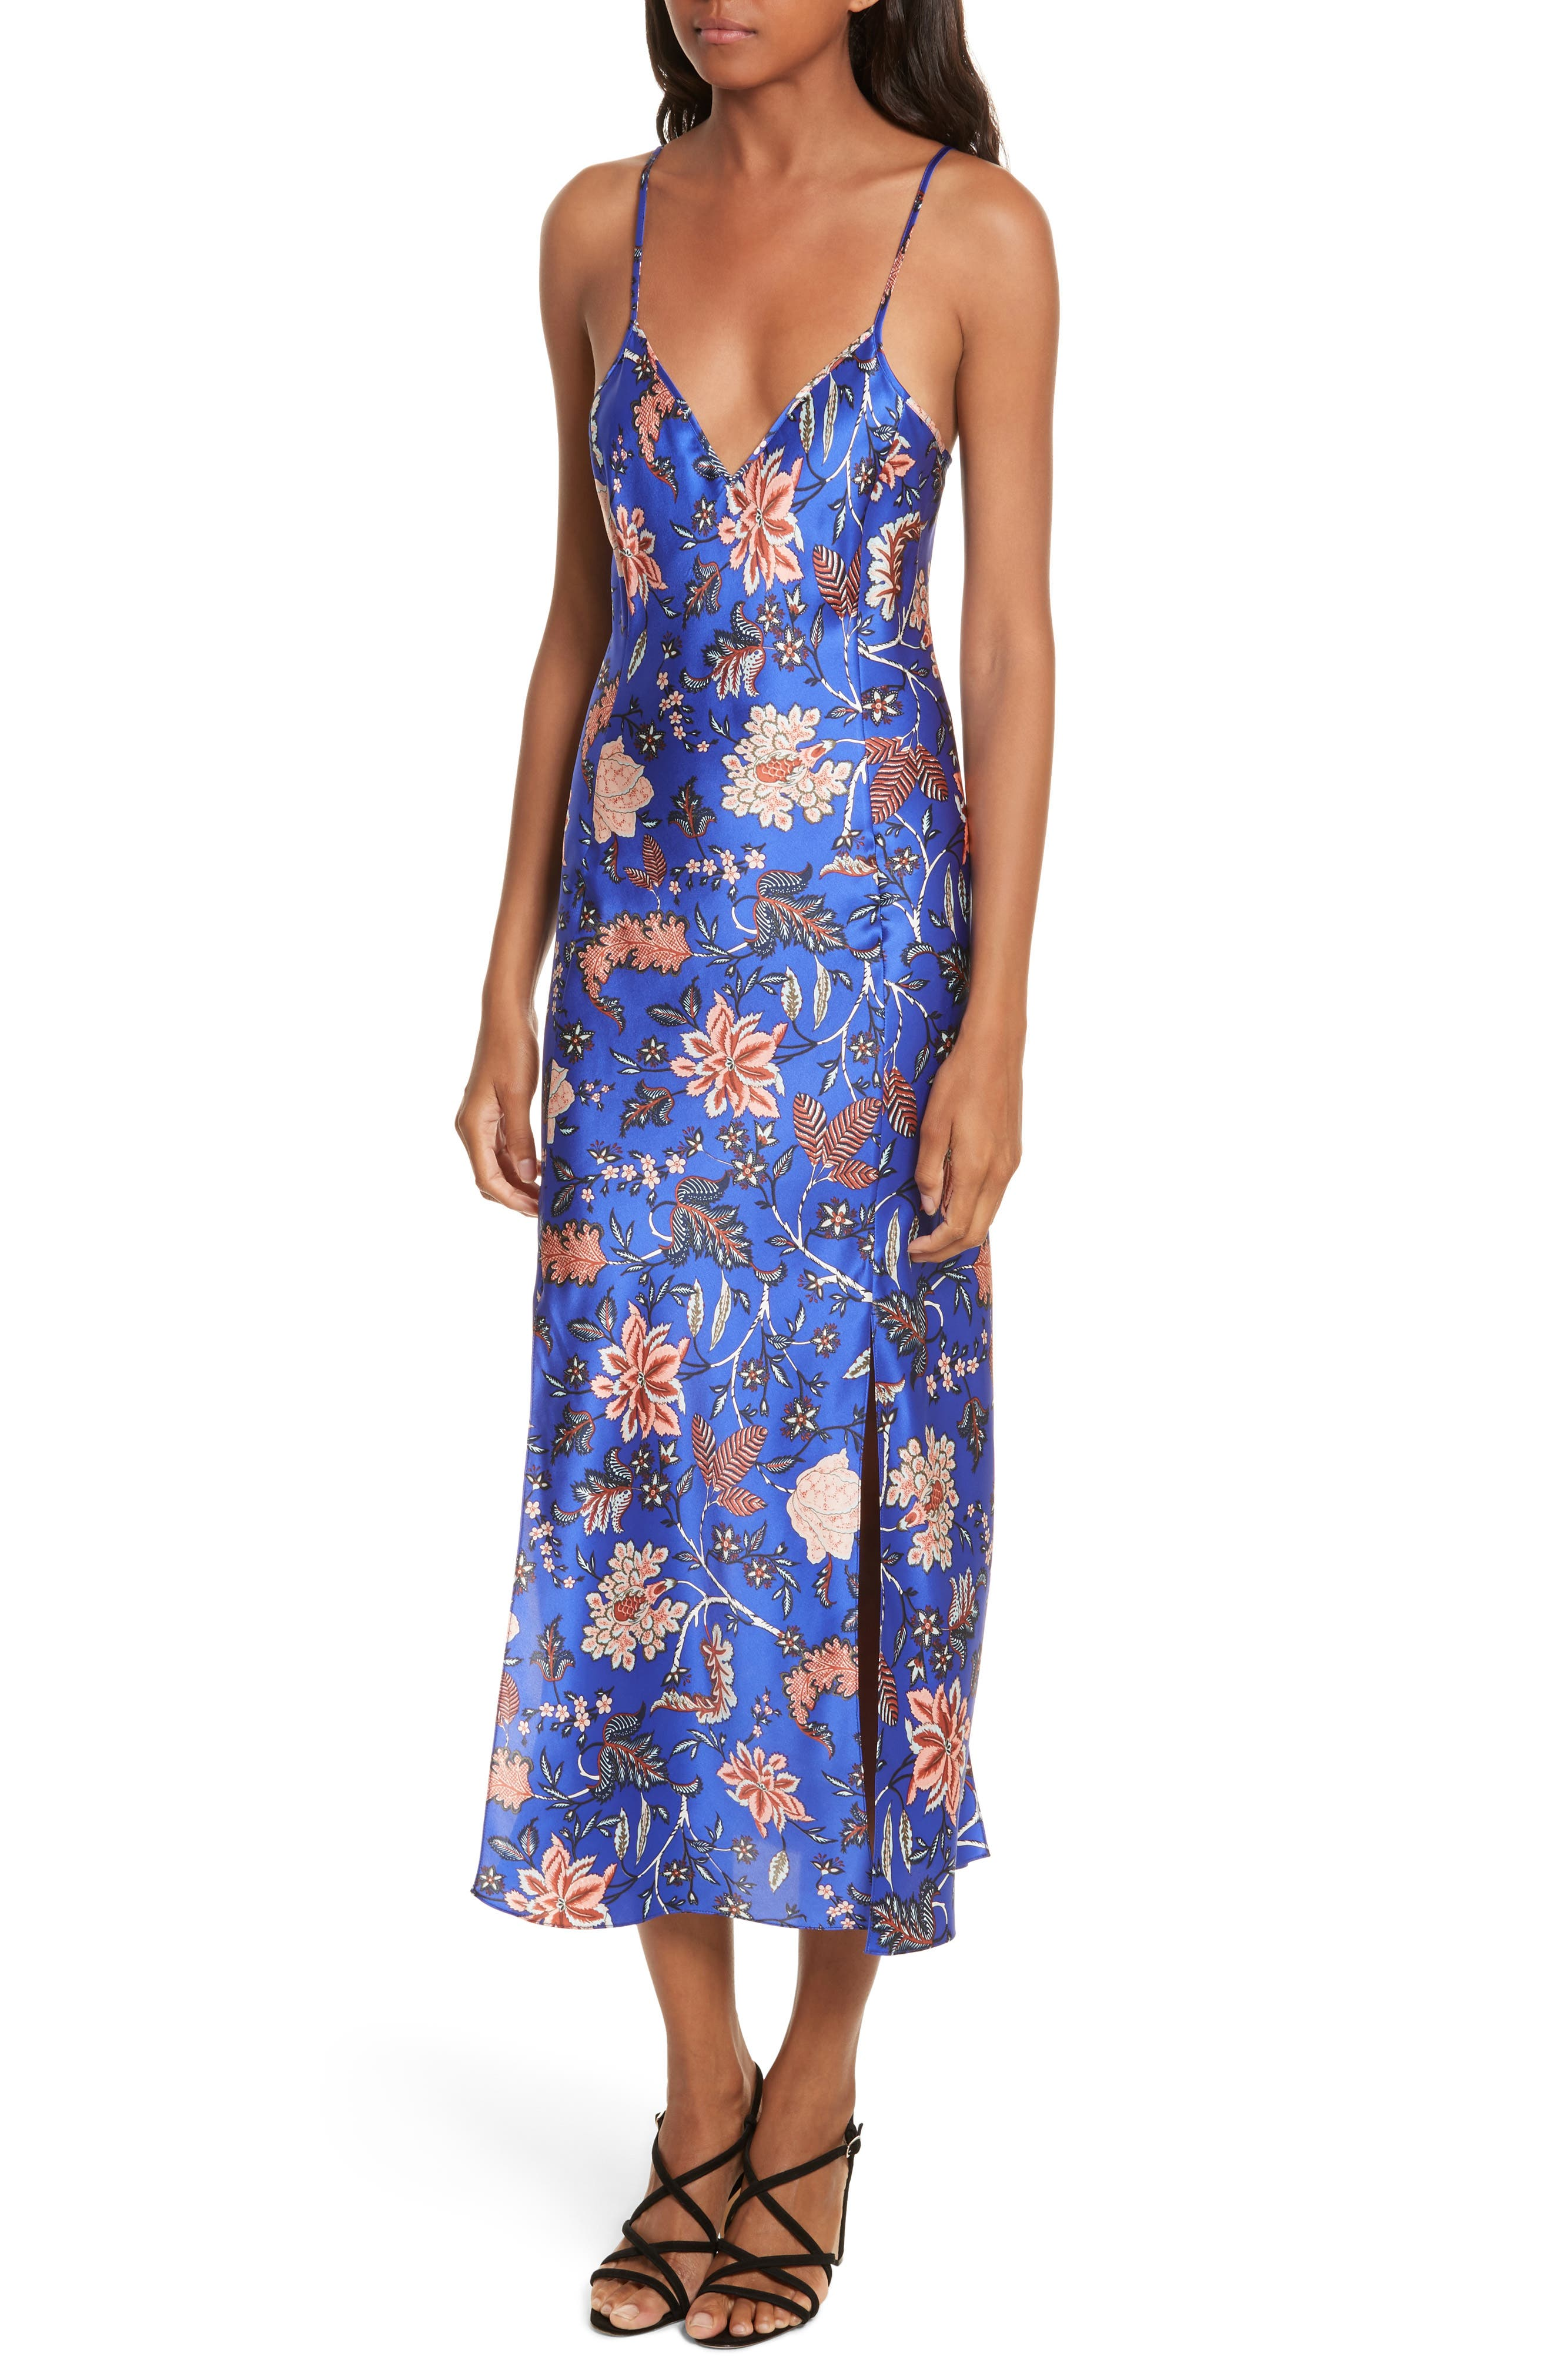 Diane von Furstenberg Mesh Overlay Floral Midi Dress,                             Alternate thumbnail 4, color,                             Canton Electric Blue